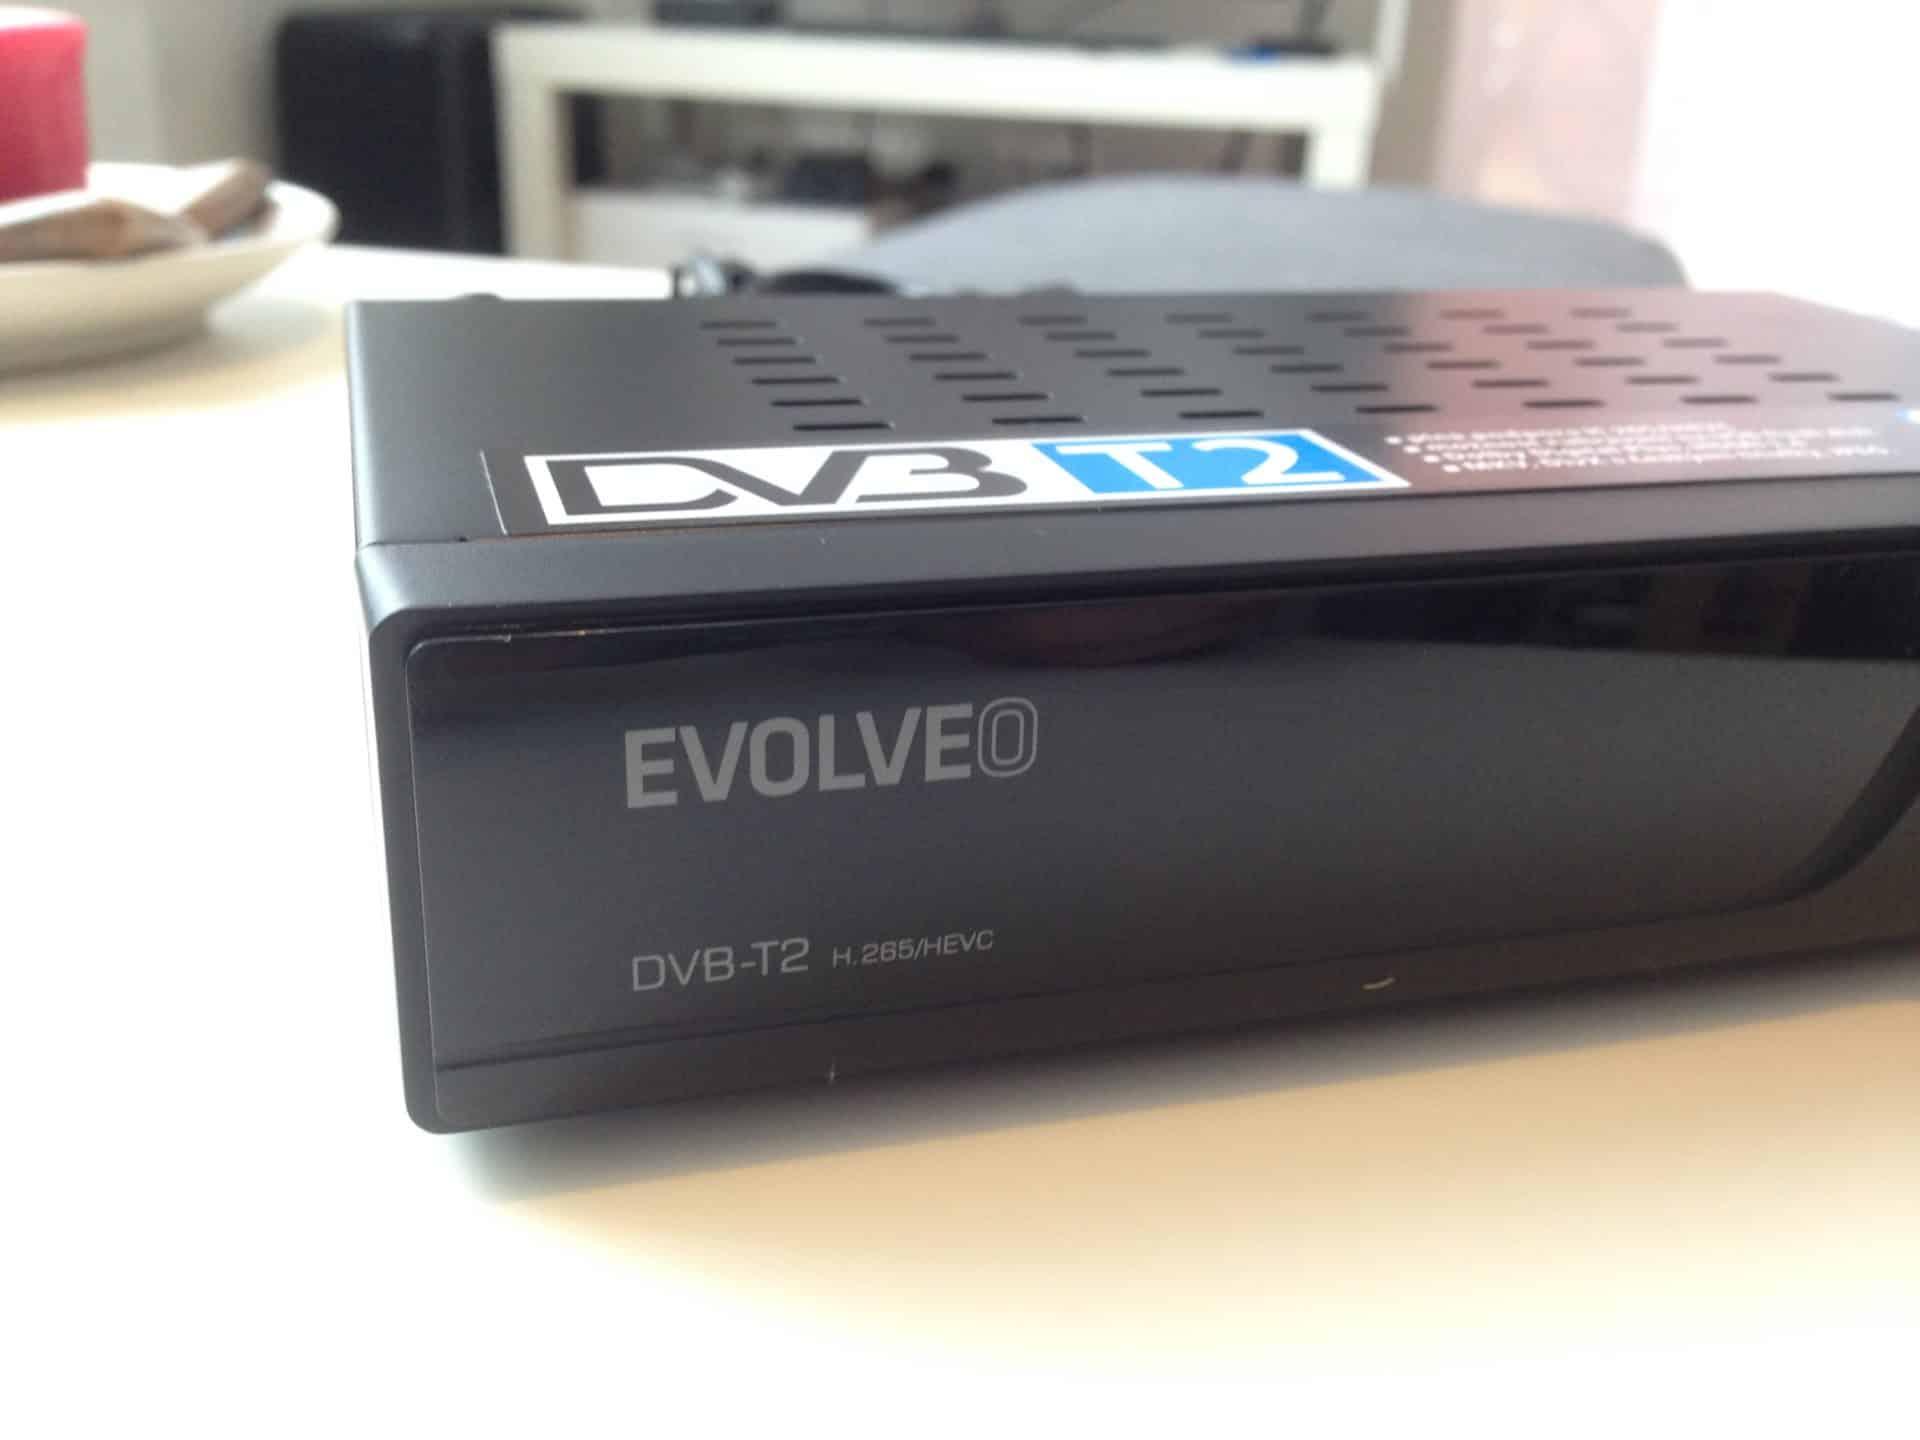 Setobox pro DVB-T2